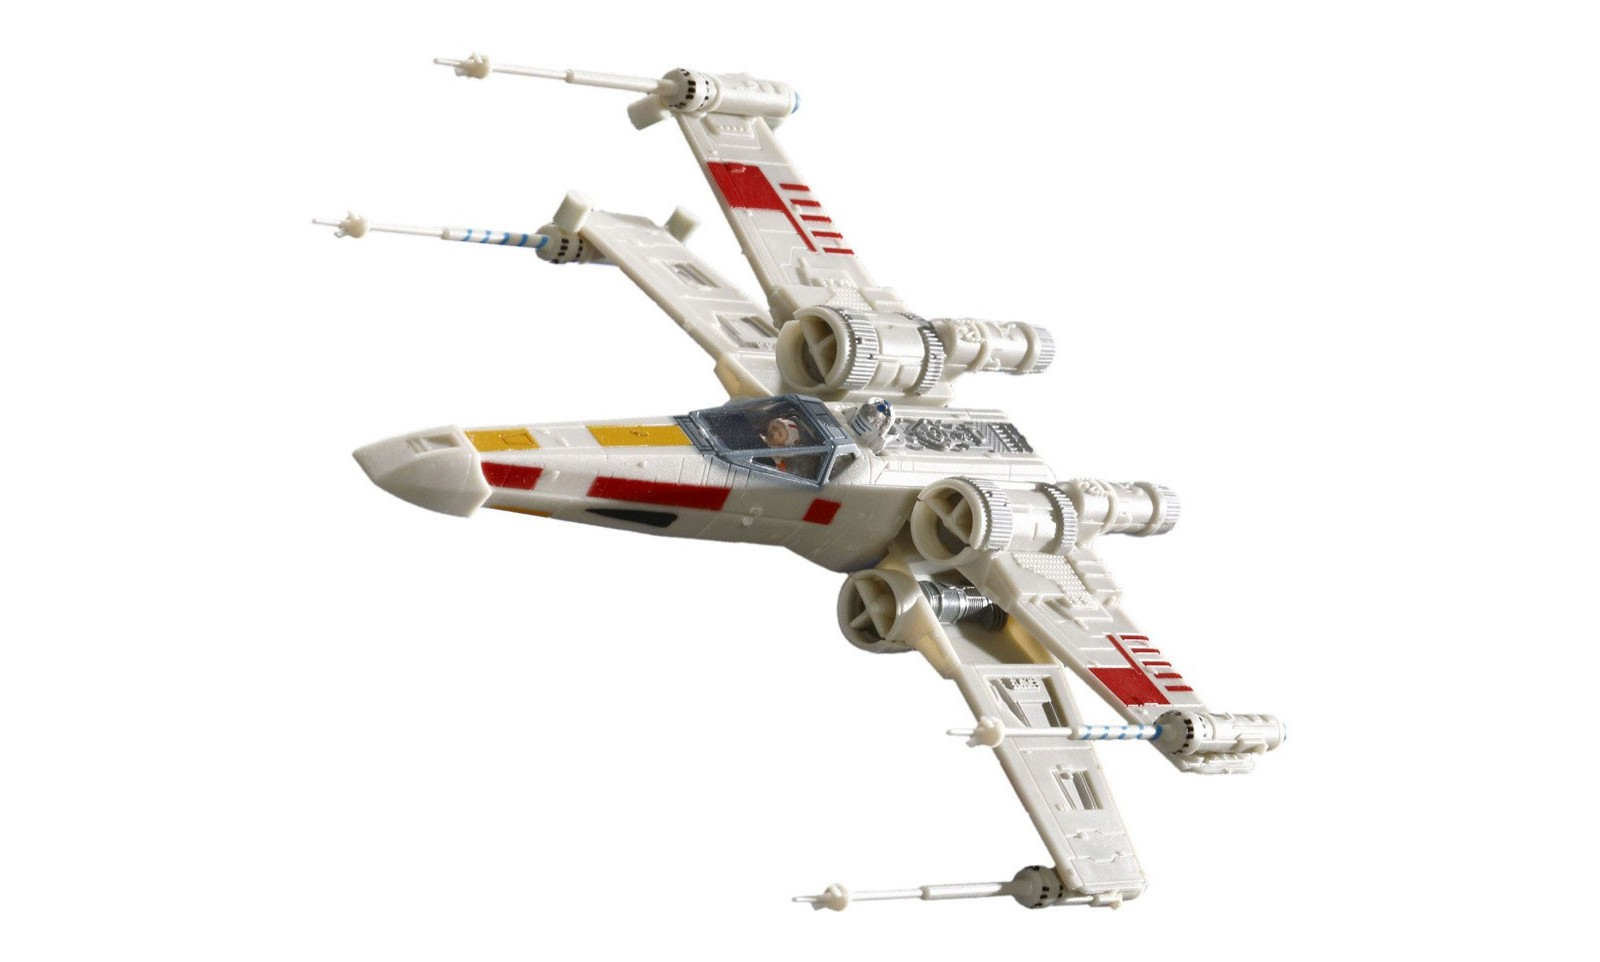 star wars maquette vaisseau luke skywalker x wing fighter 11 cm r plique cin ma film. Black Bedroom Furniture Sets. Home Design Ideas